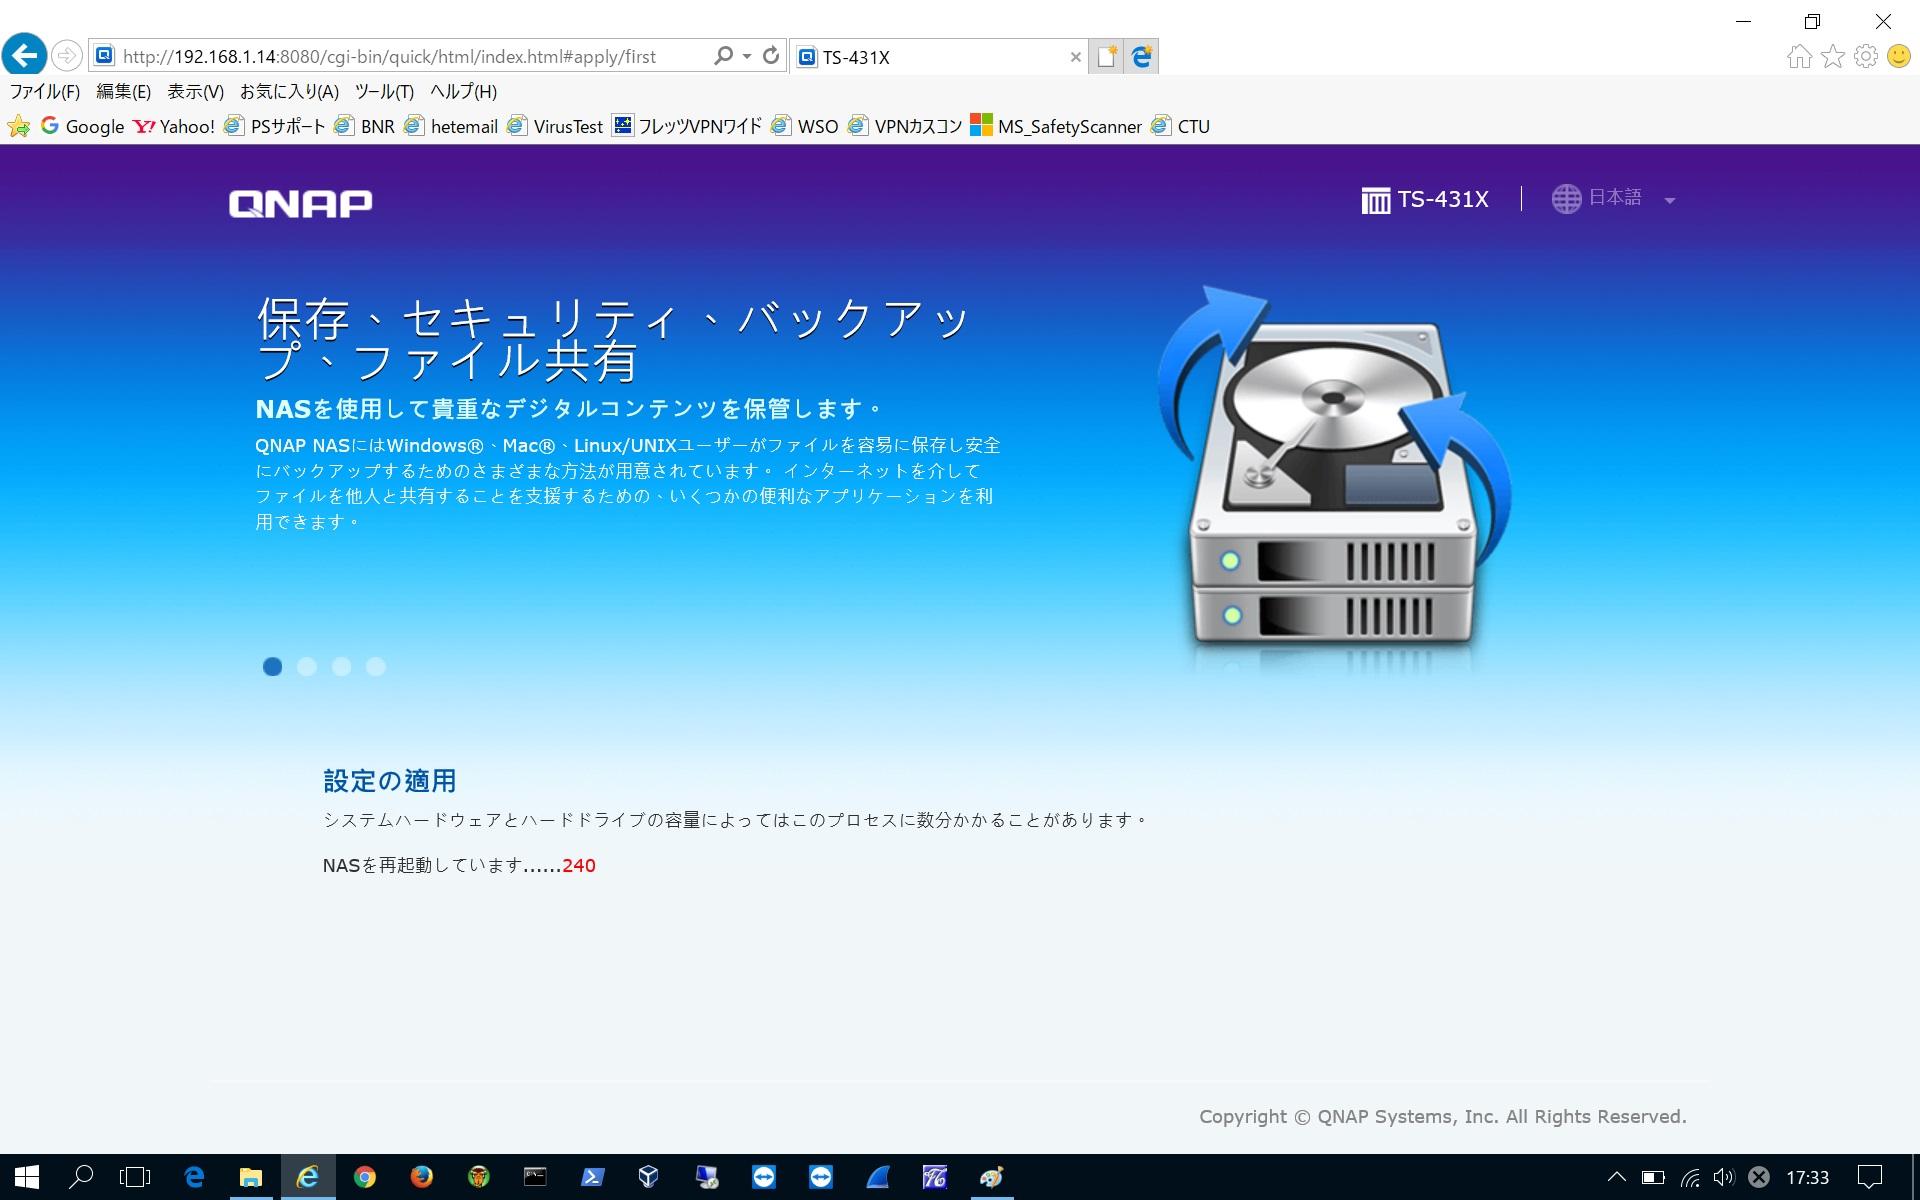 011 QNAP-NAS_install